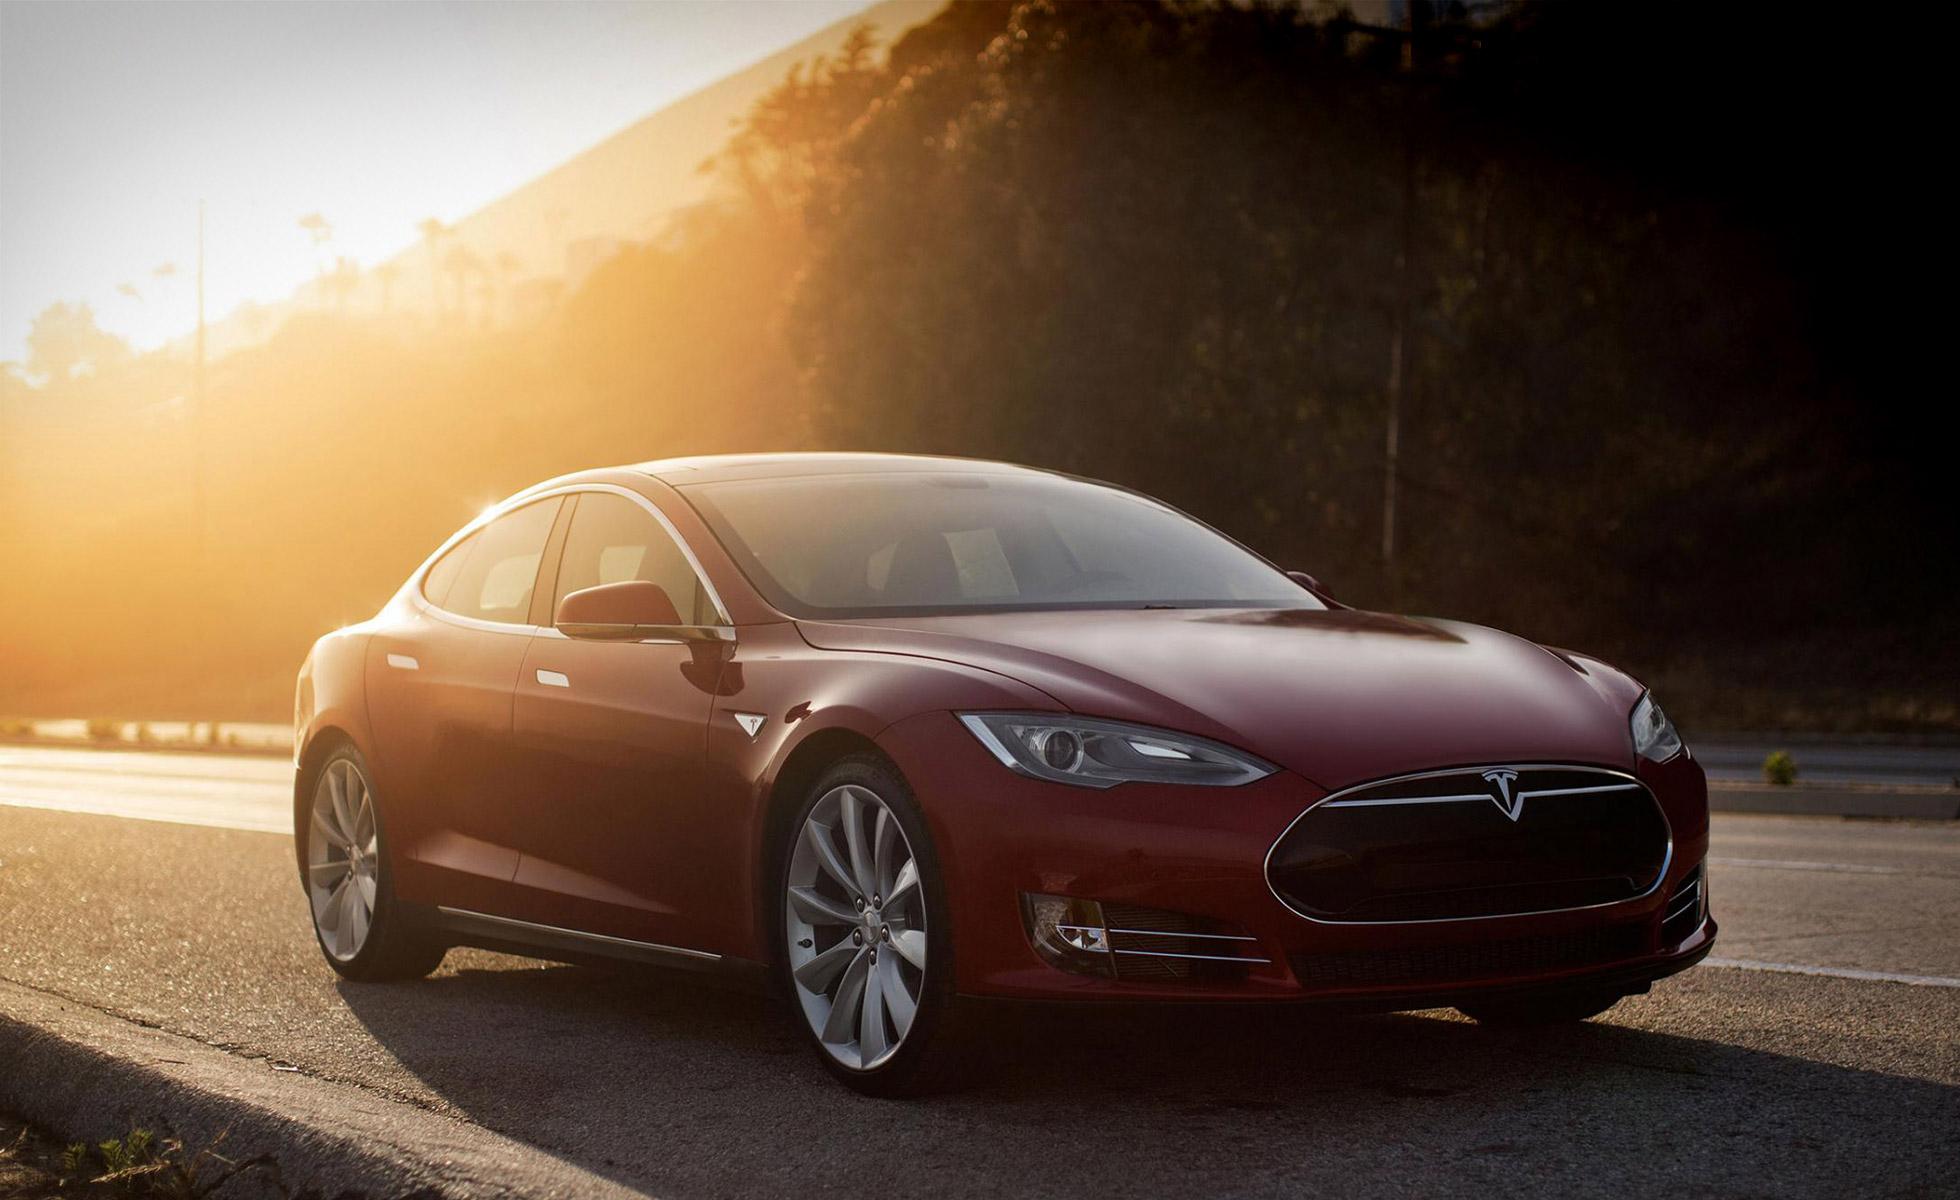 Tesla model s delivery time